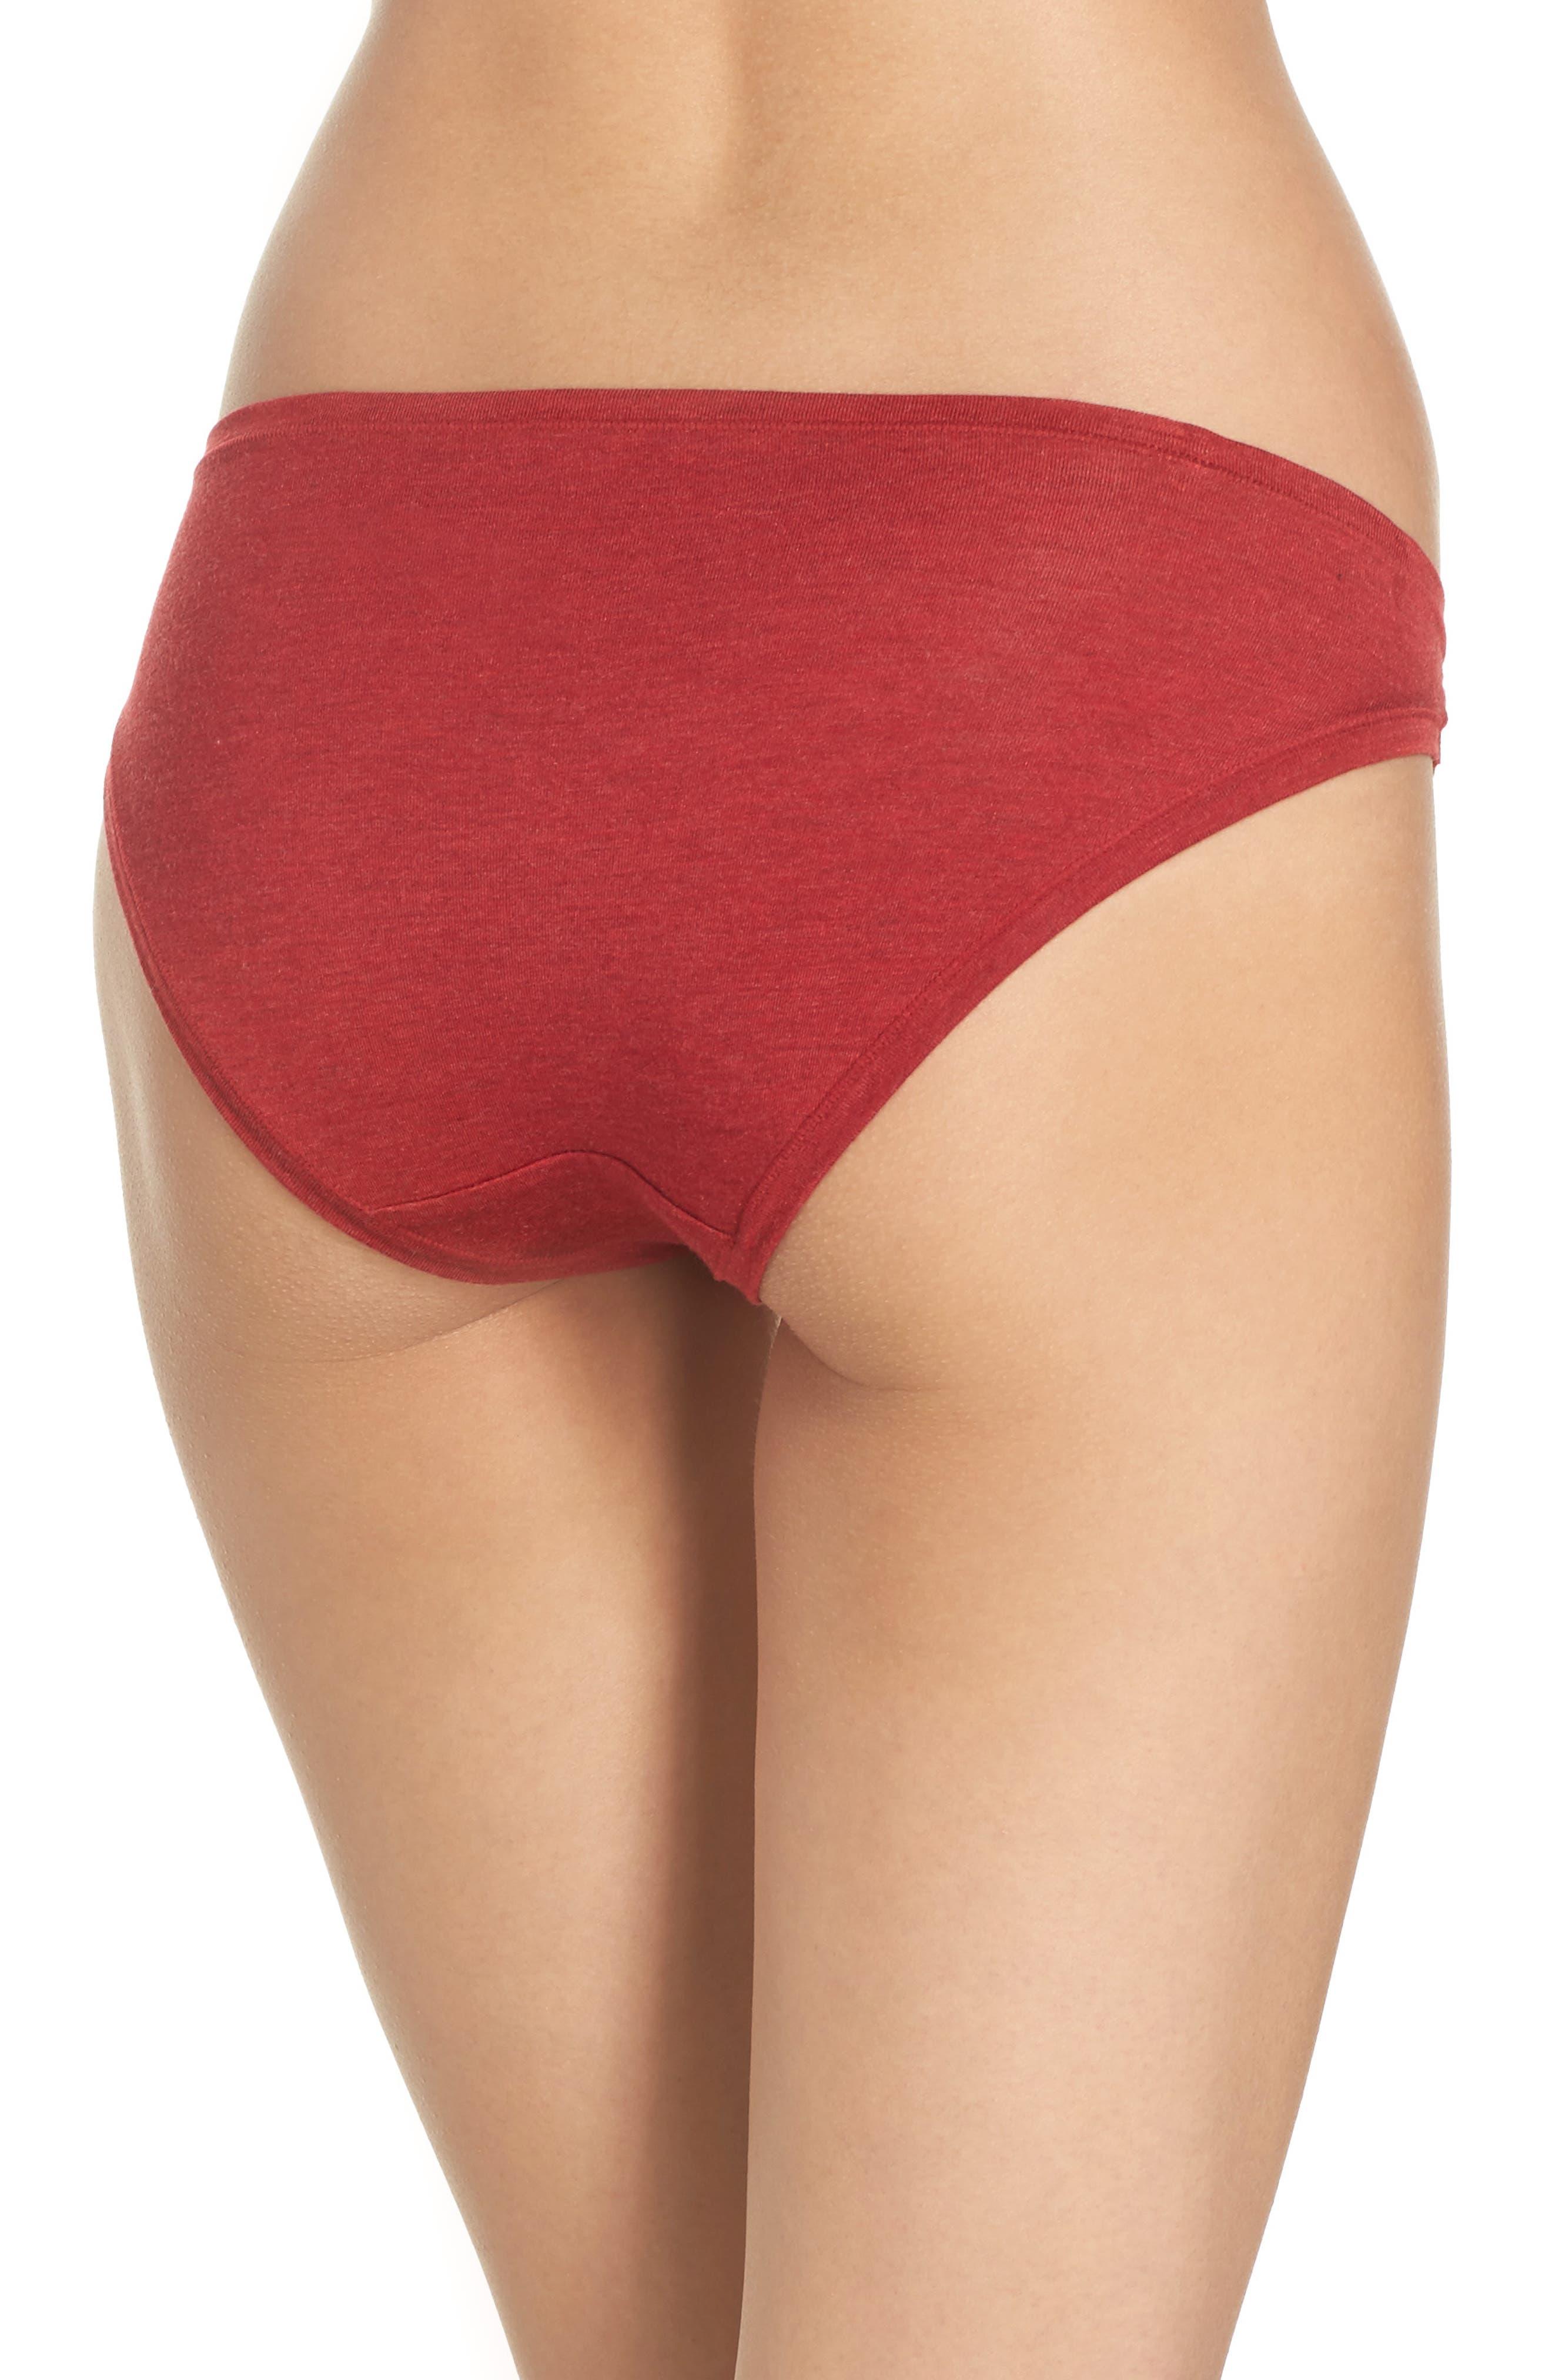 Alternate Image 2  - Natori Bliss Essence Bikini (3 for $45)